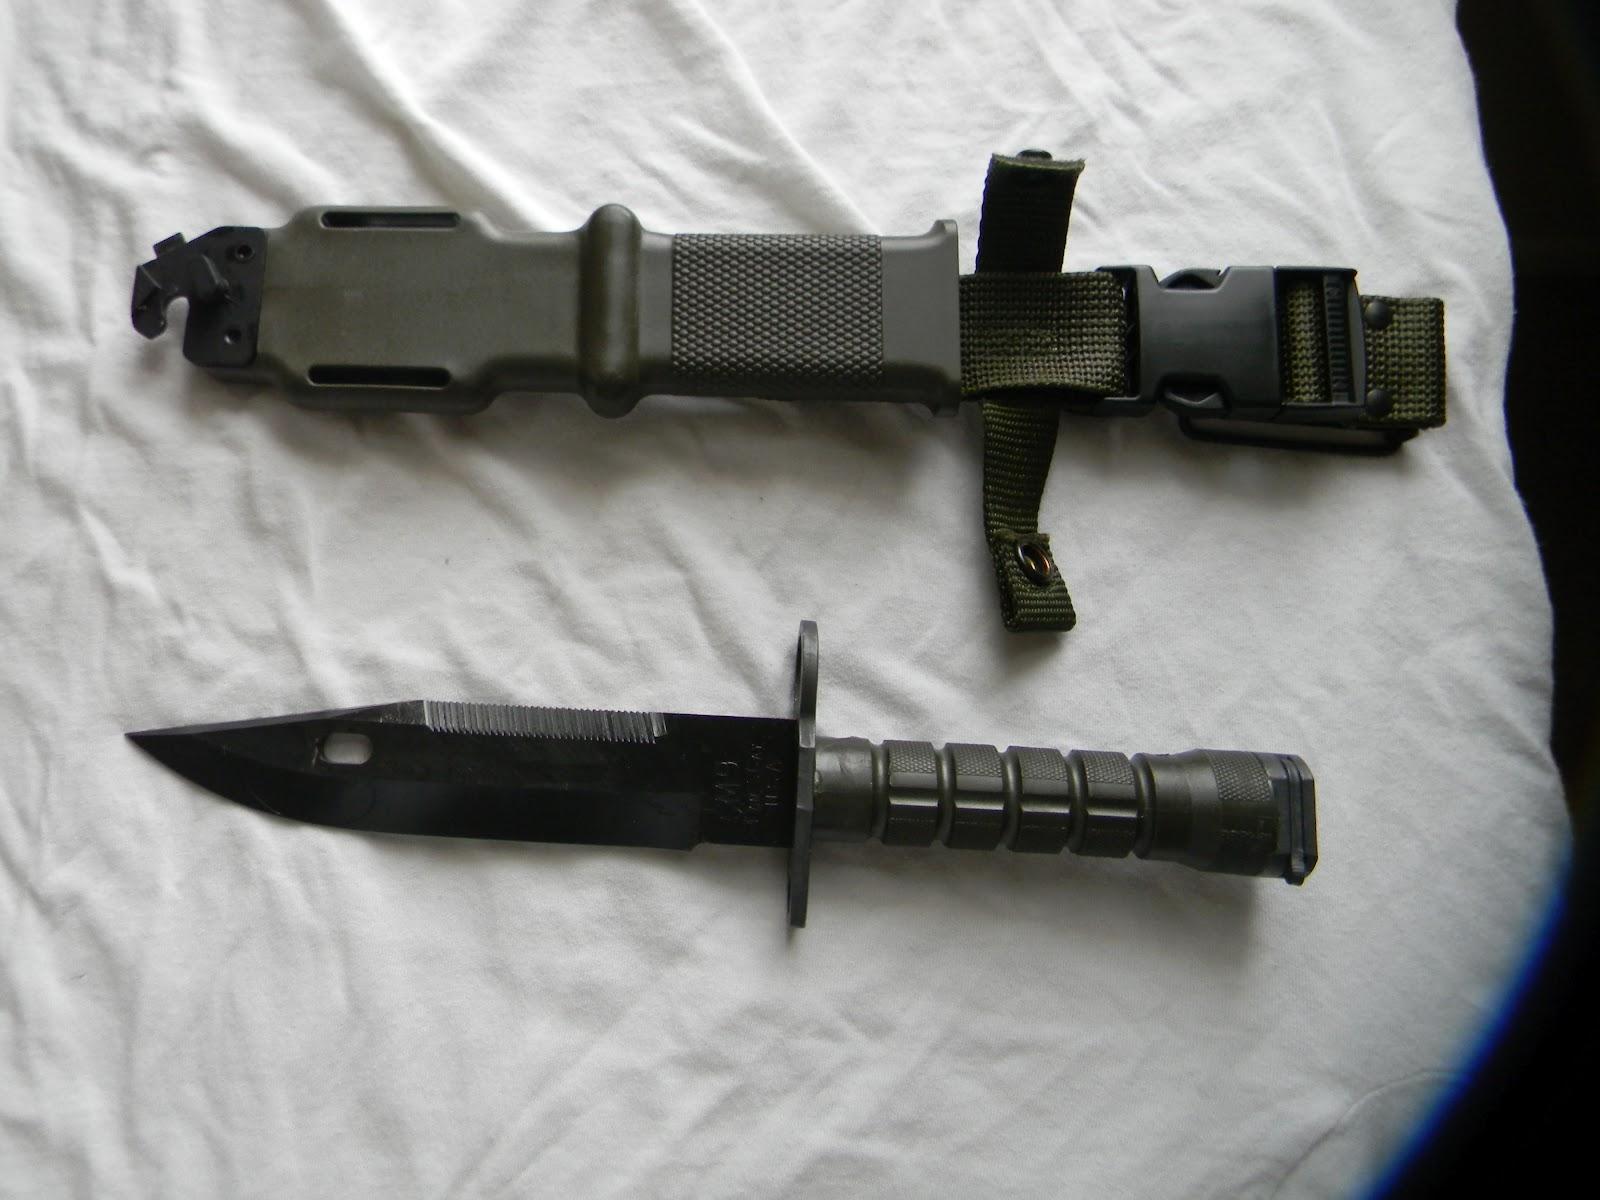 M9 Bayonet – Wonderful Image Gallery